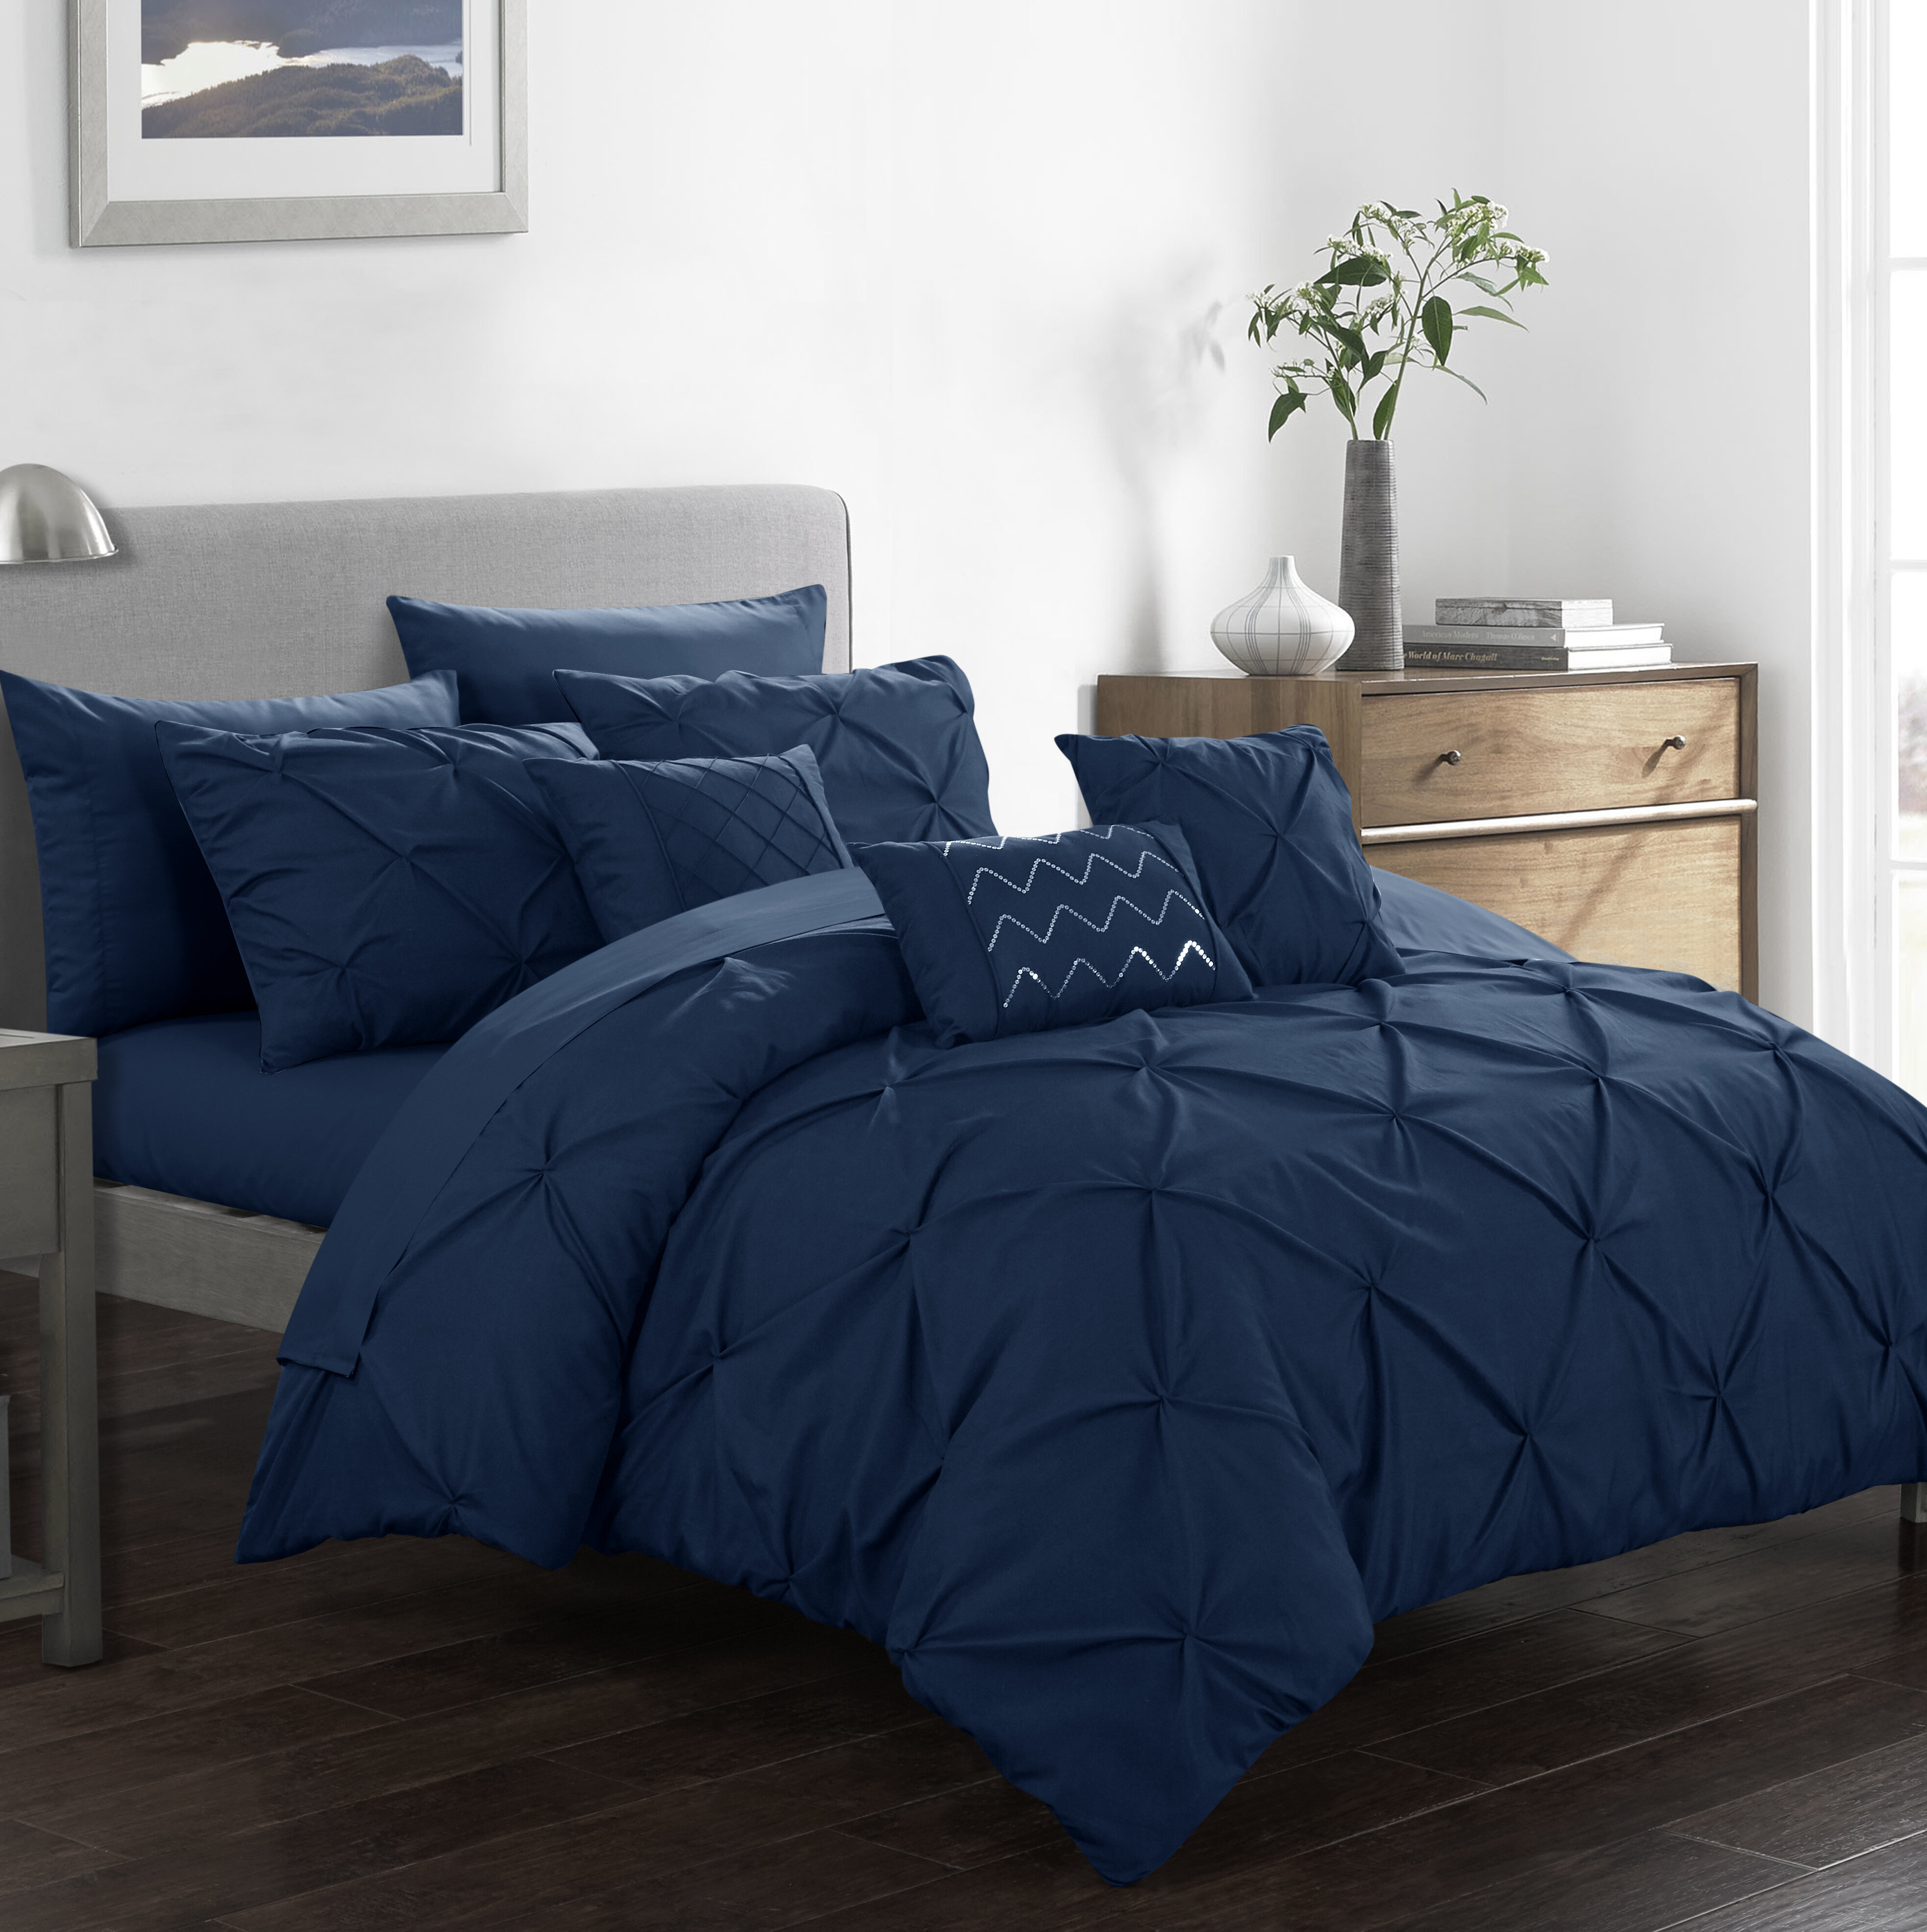 Willa Arlo Interiors Karyn 10 Piece Comforter Set Reviews Wayfair Ca